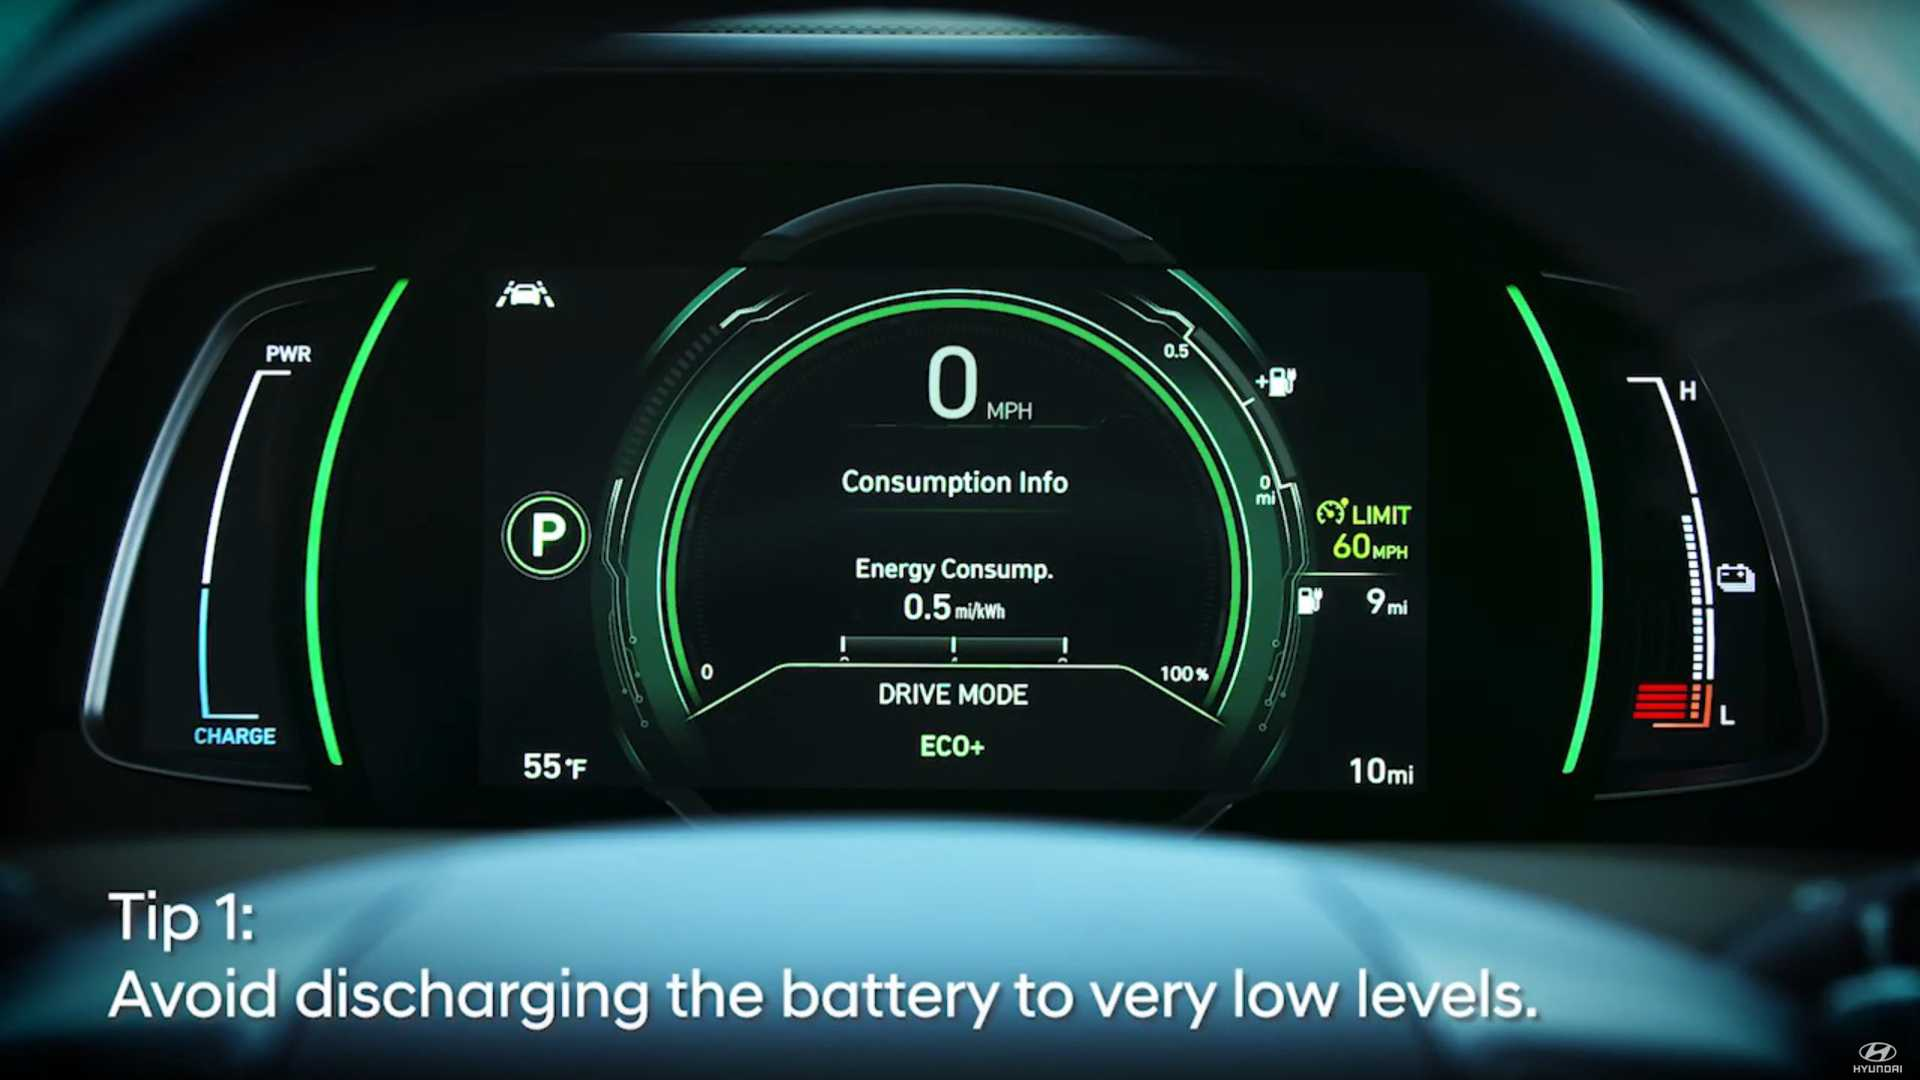 Hyundai tips how to maximize electric car range